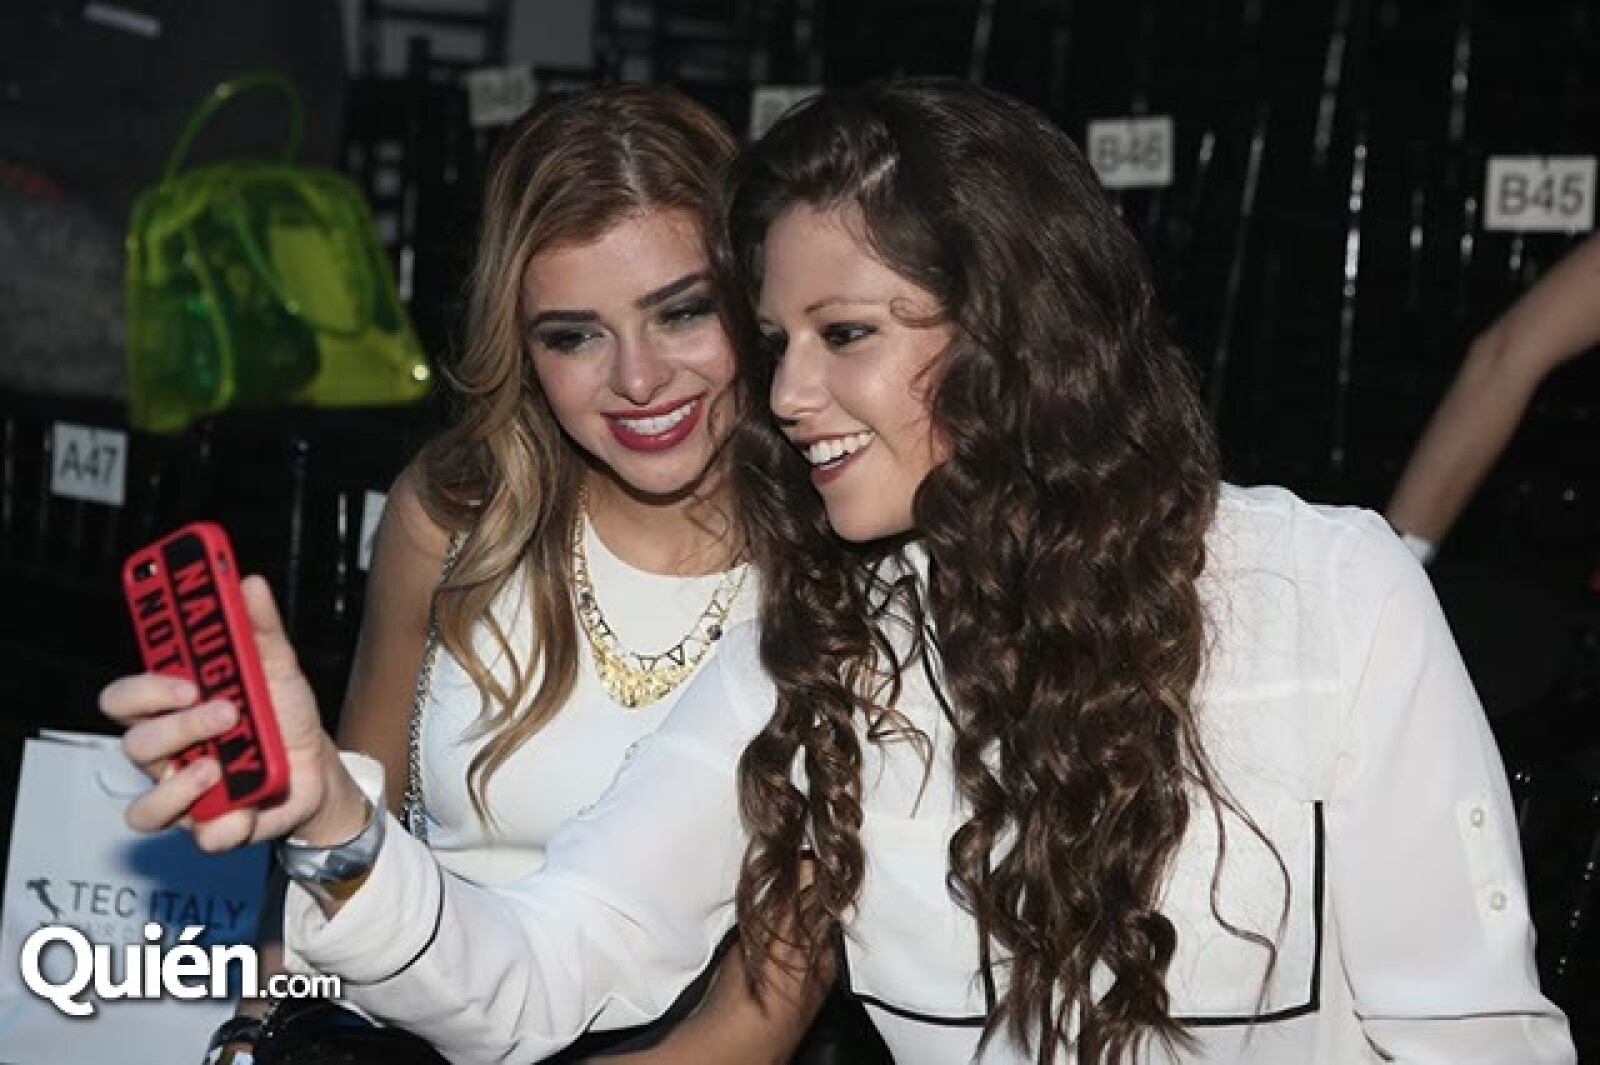 Carla Mauri y Ana Paola Péres Arizti